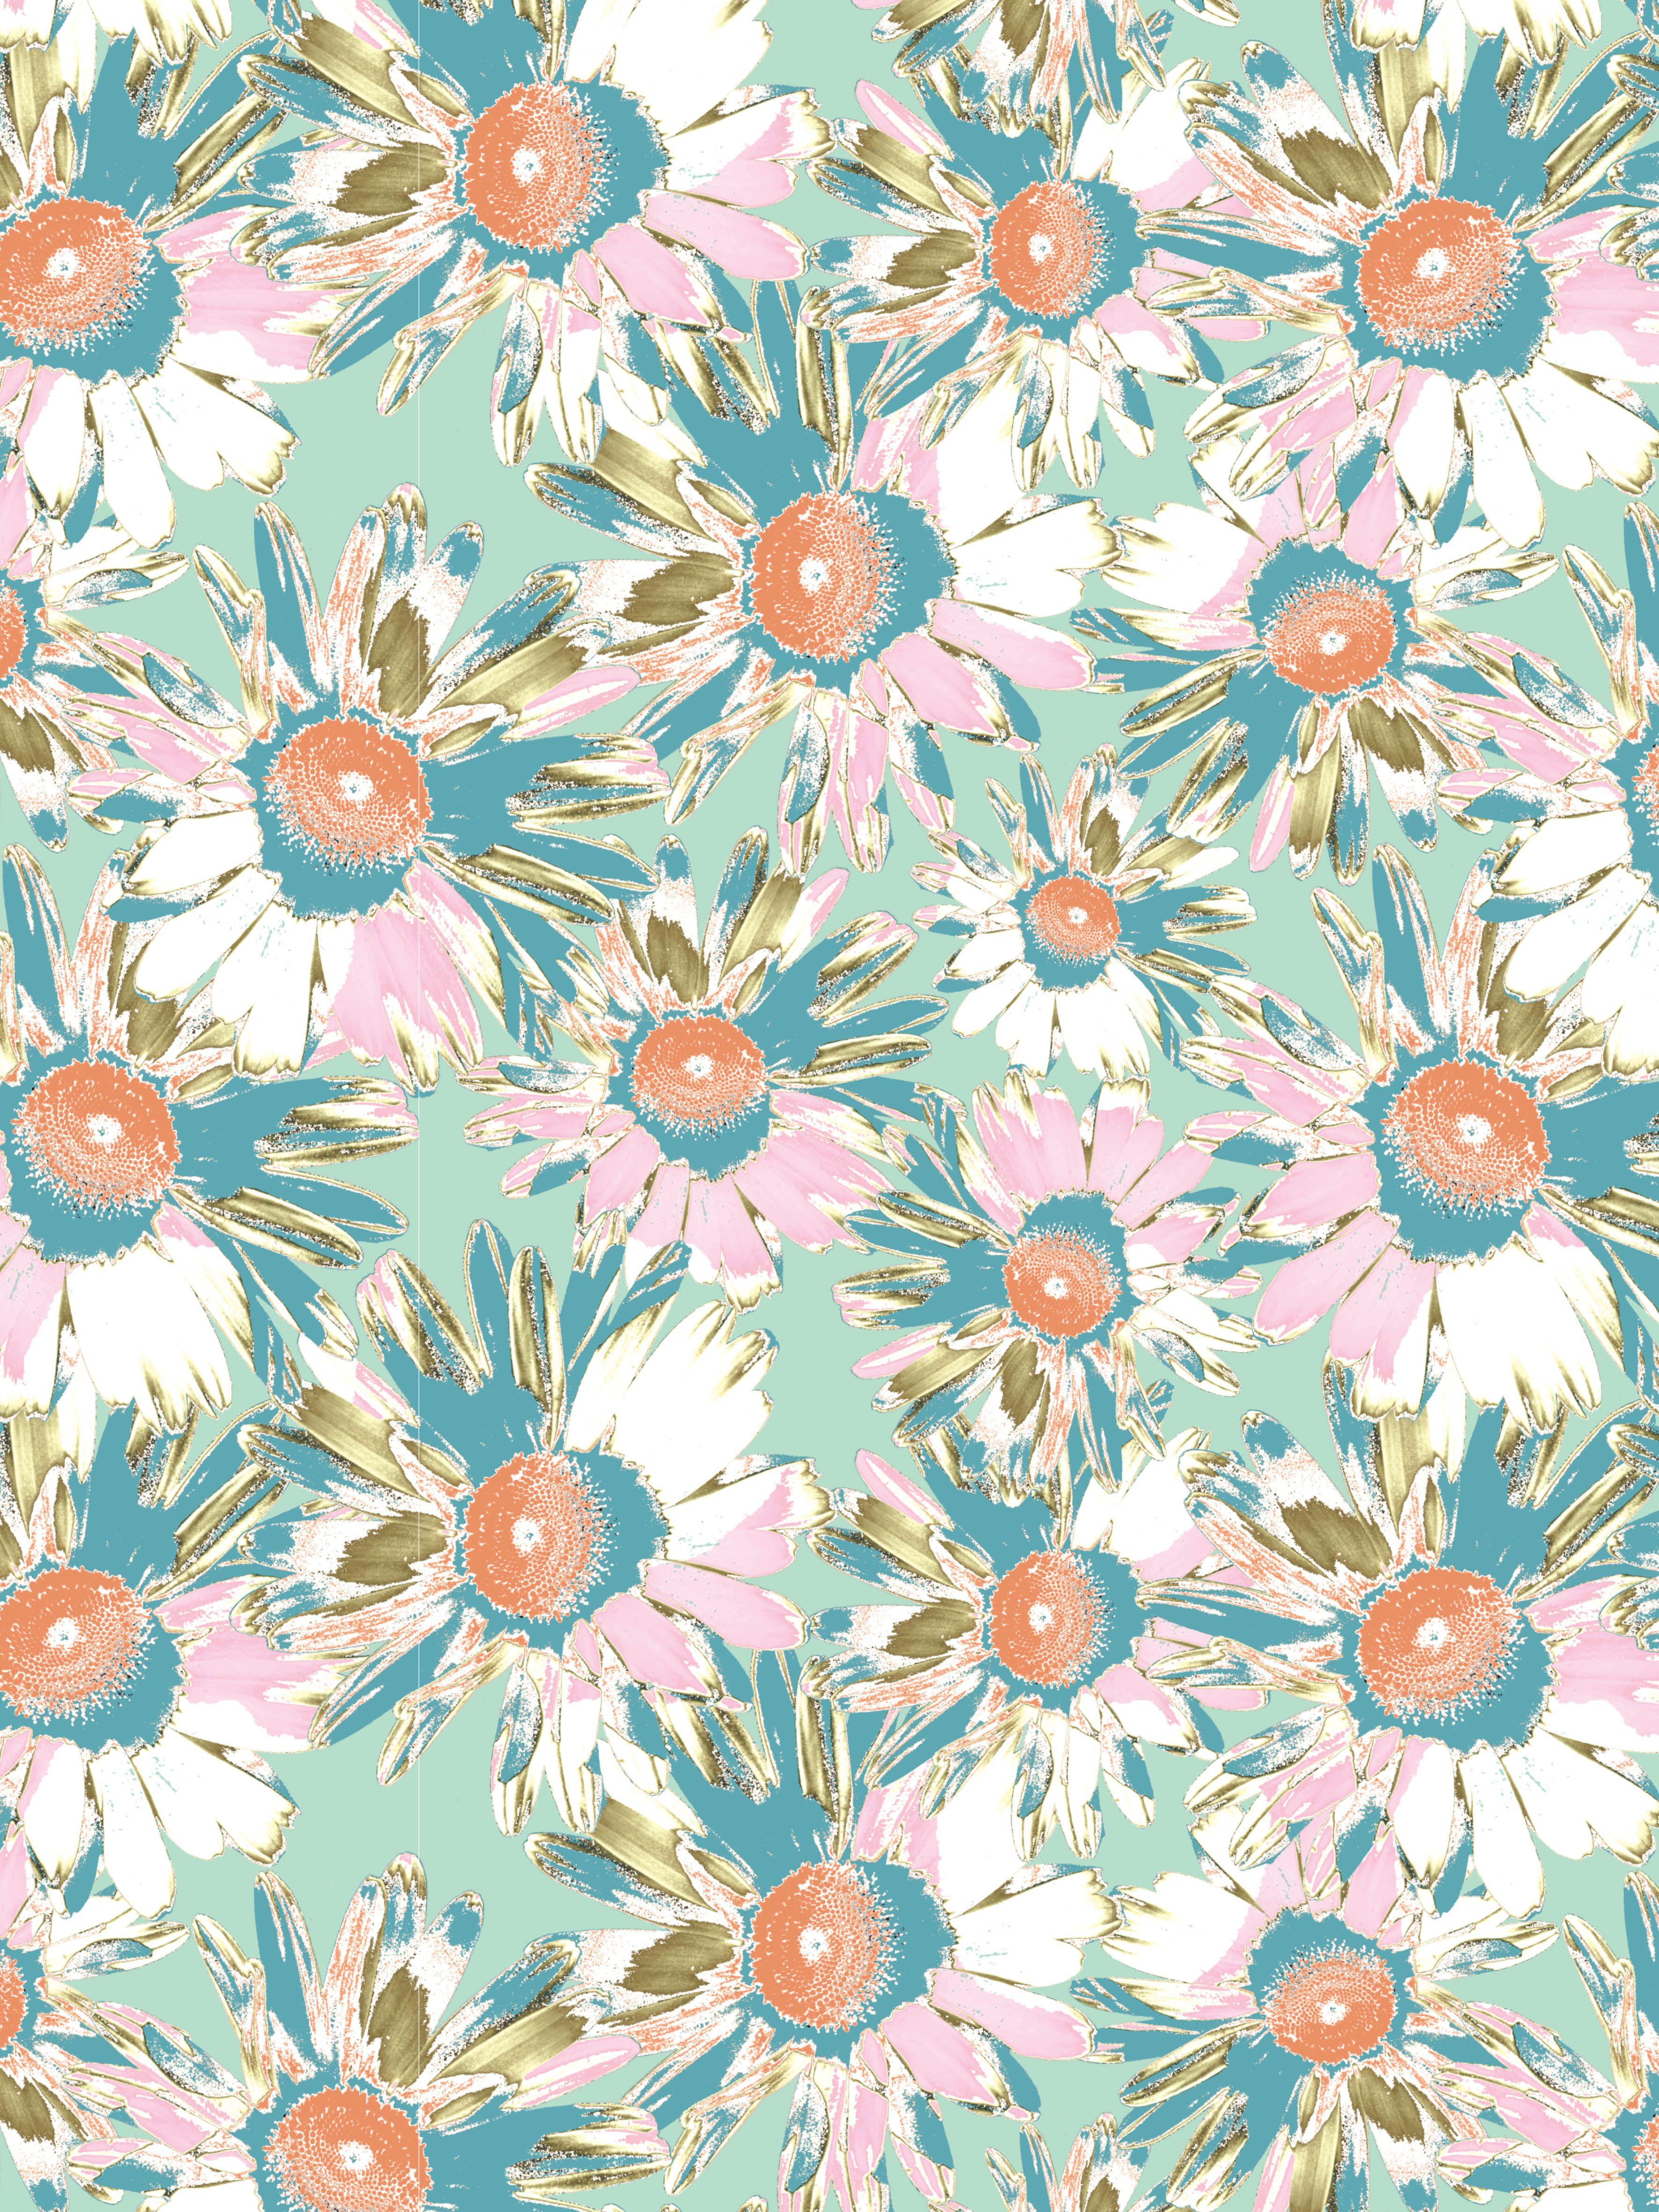 Wild Daisy Fabric - Mint - Organic Cotton Panama / Fat Quarter